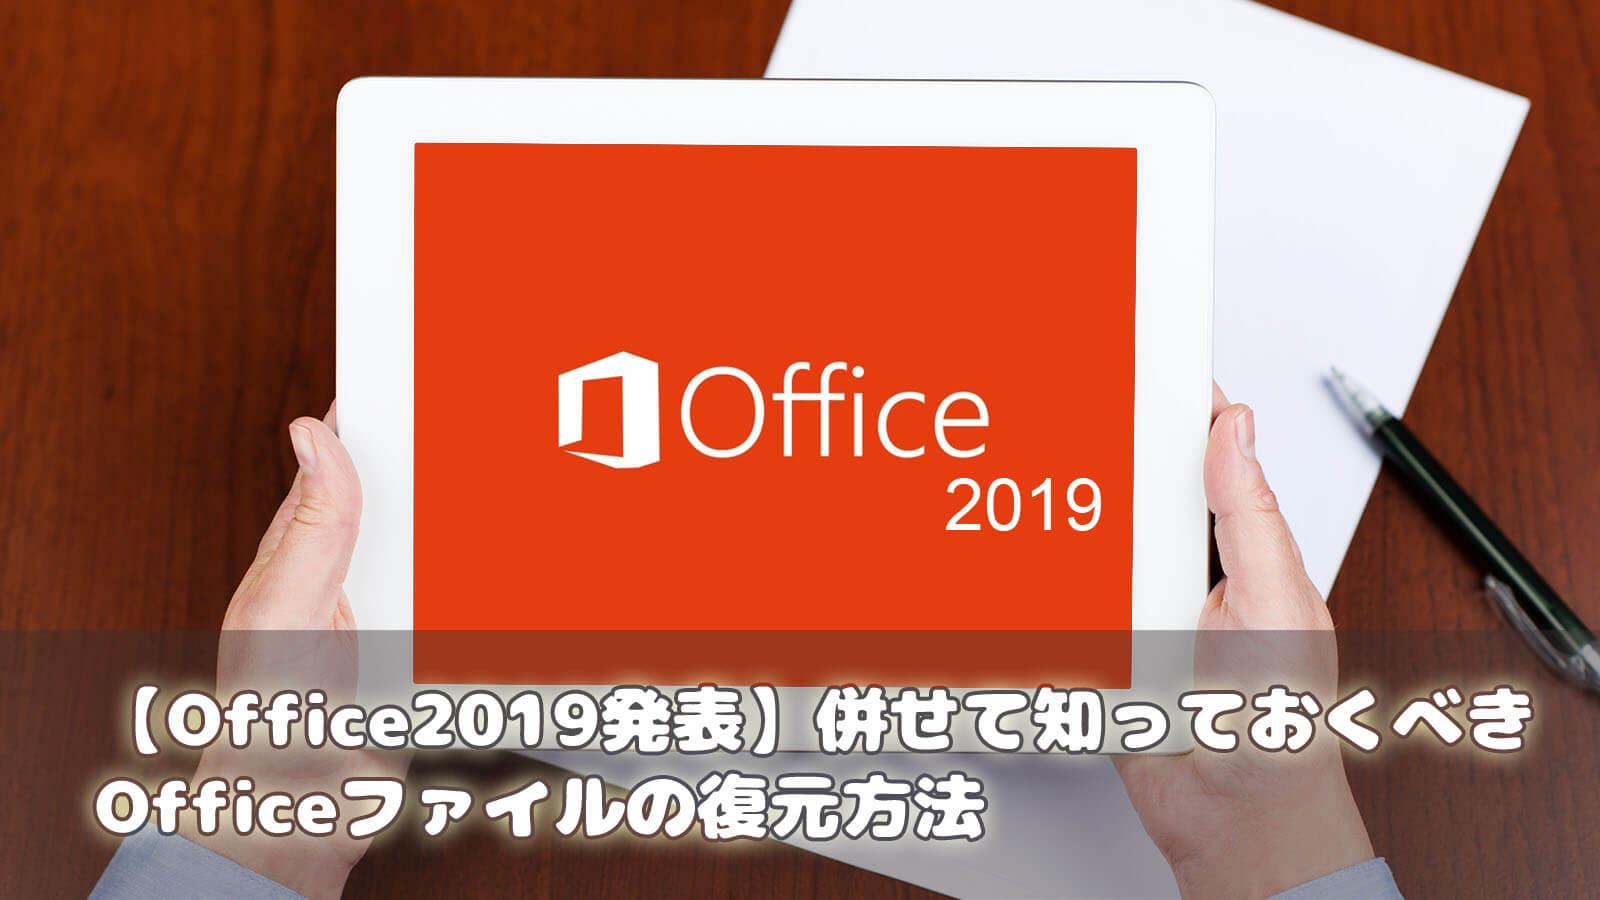 Office2019ファイル復元